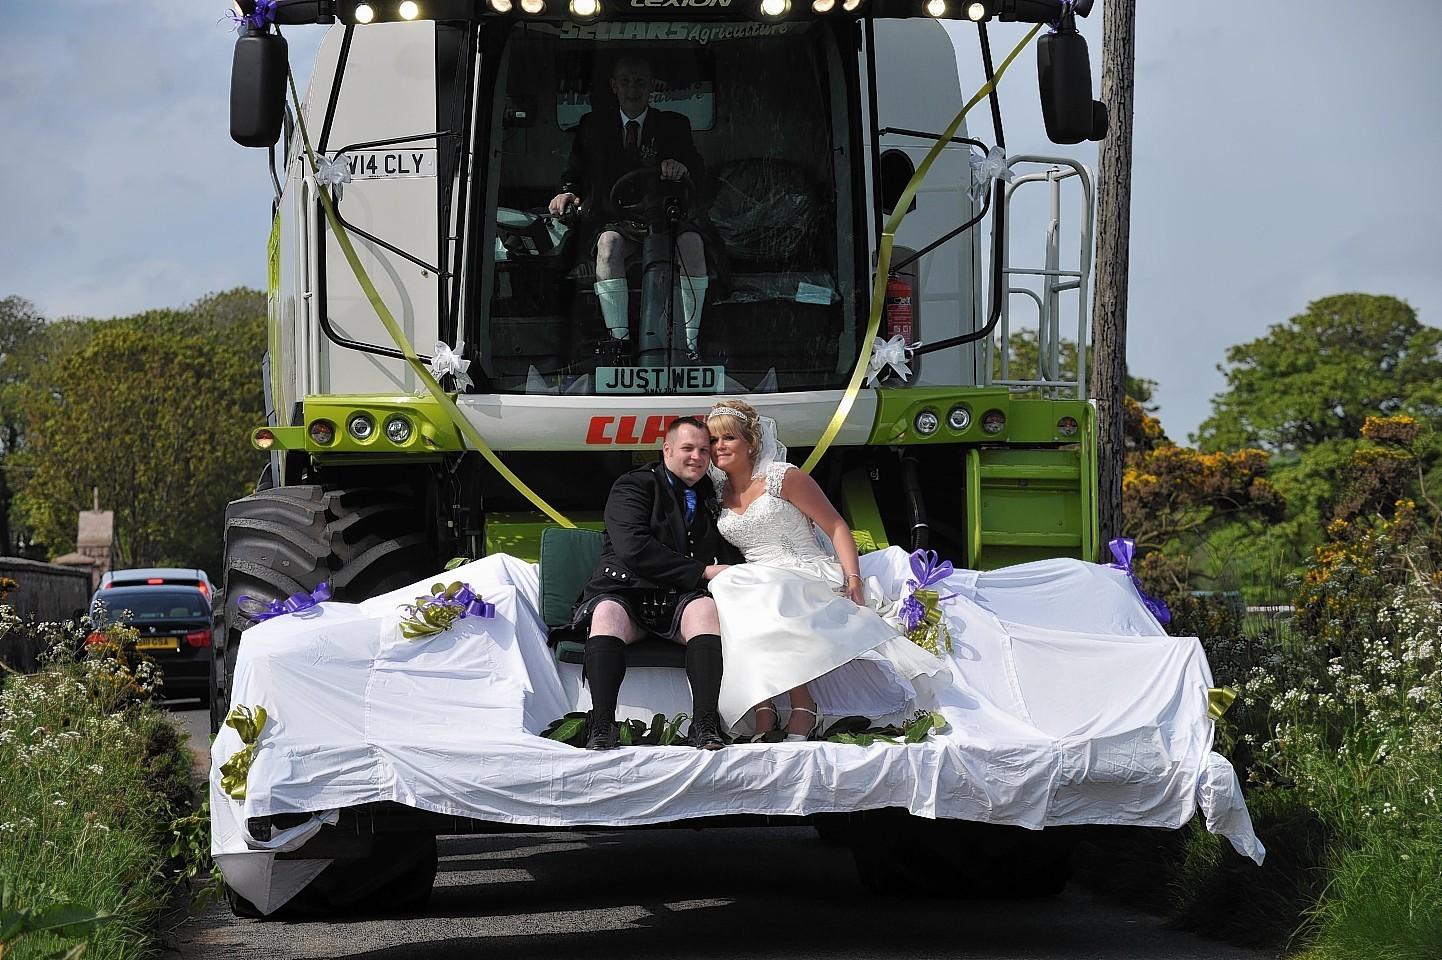 The couple's Combine Harvester wedding